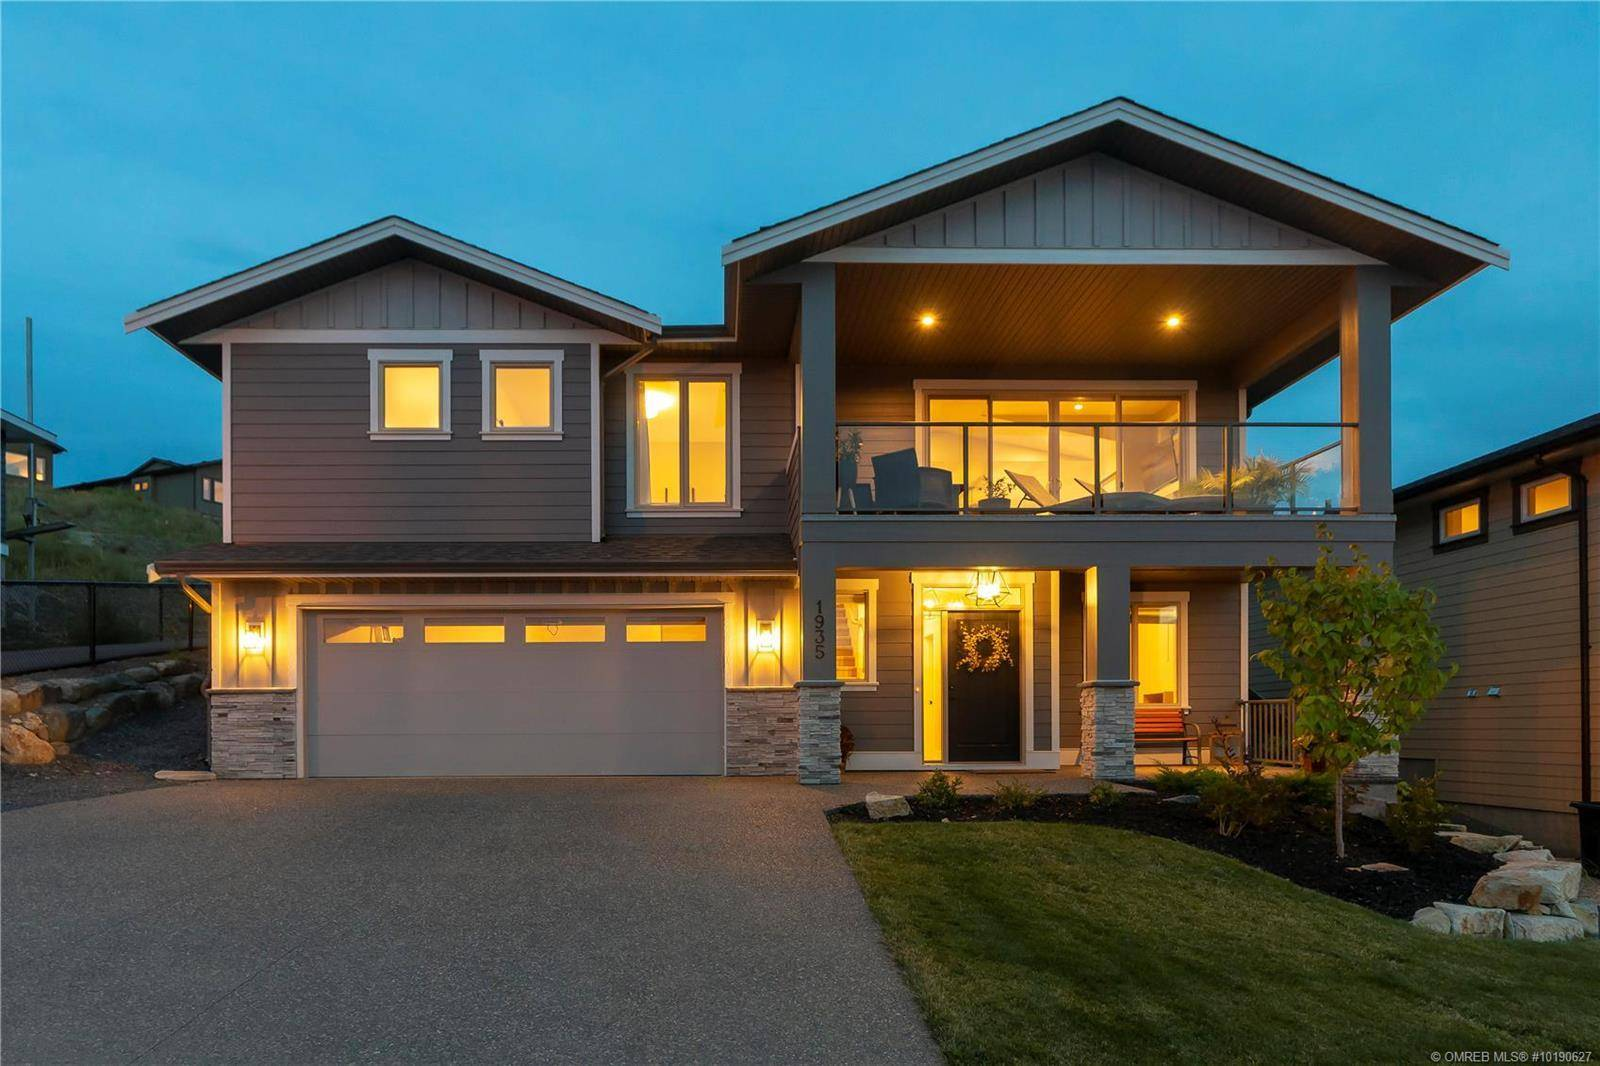 House for sale at 1935 Foxtail Te Kelowna British Columbia - MLS: 10190627